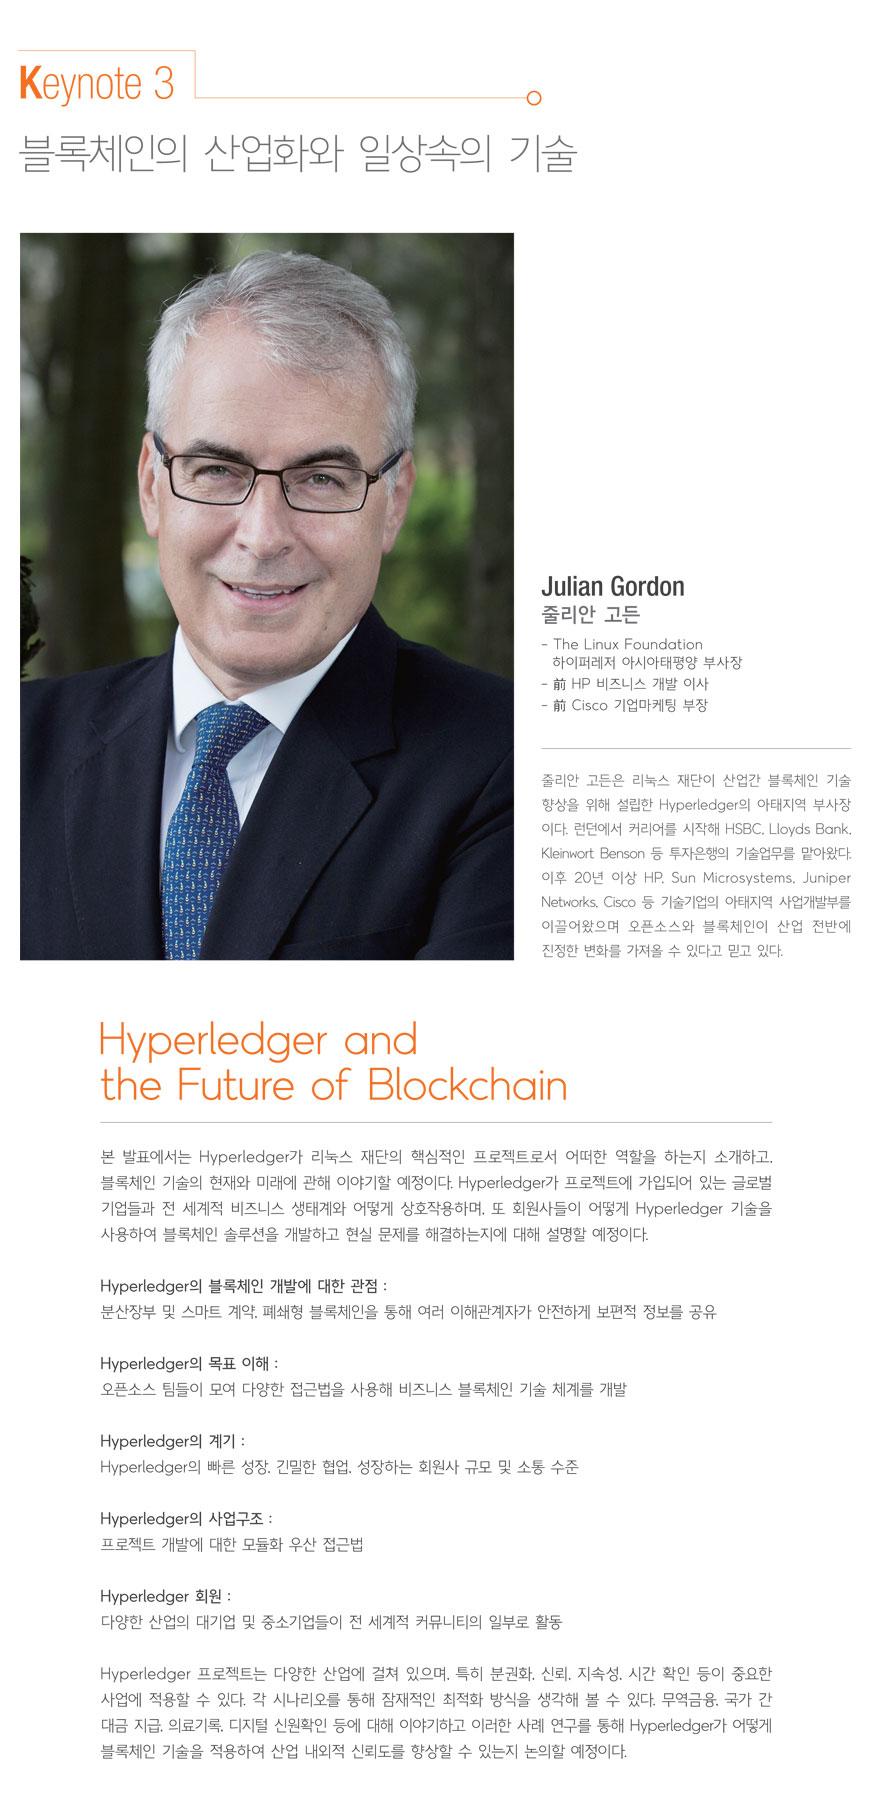 Keynote3:블록체인의 산업화와 일상속의 기술, 줄리안 고든